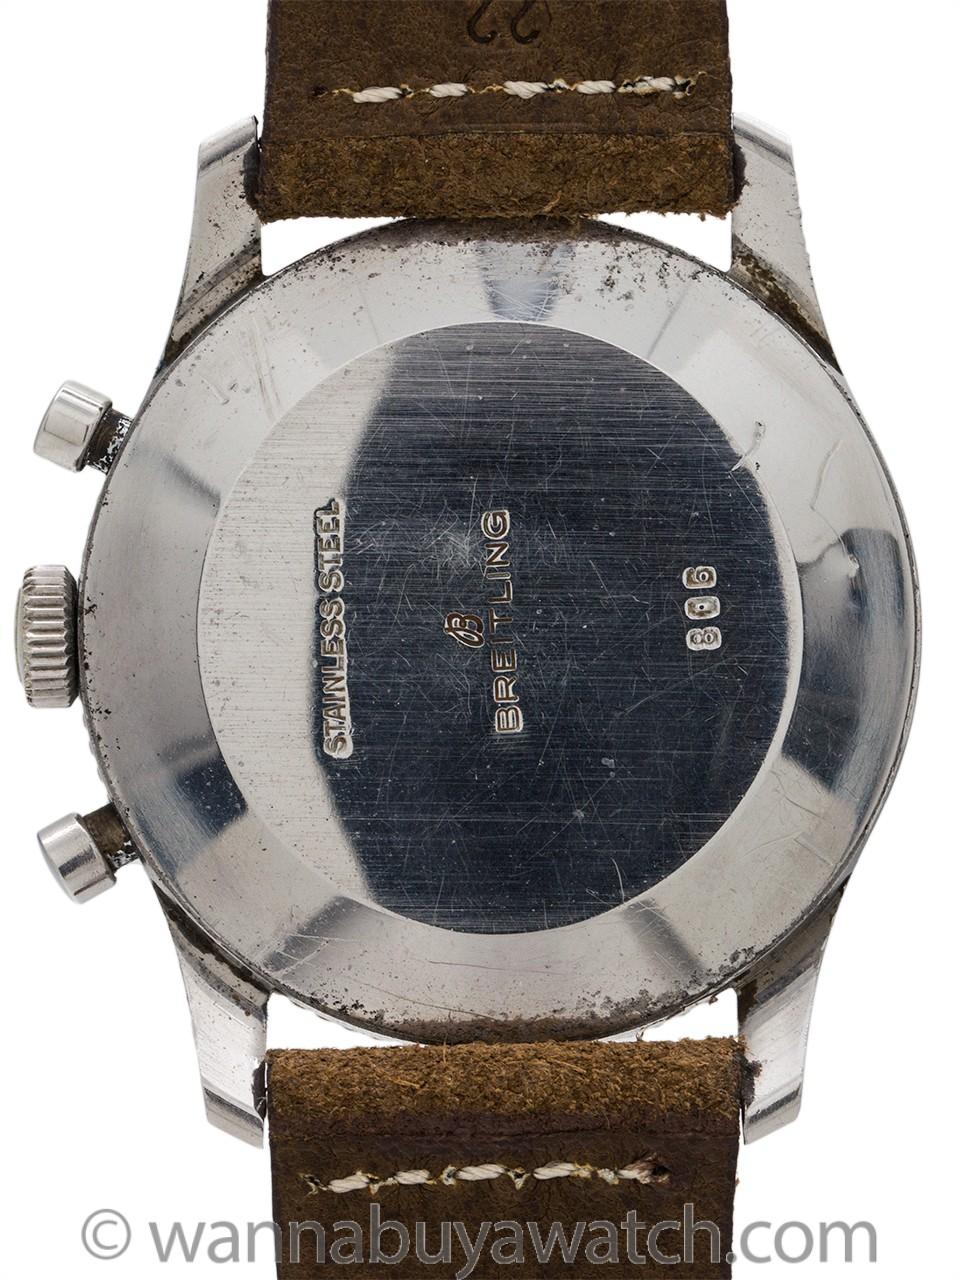 Breitling Navitimer ref 806 AOPA Beaded Bezel Black Registers circa 1960's